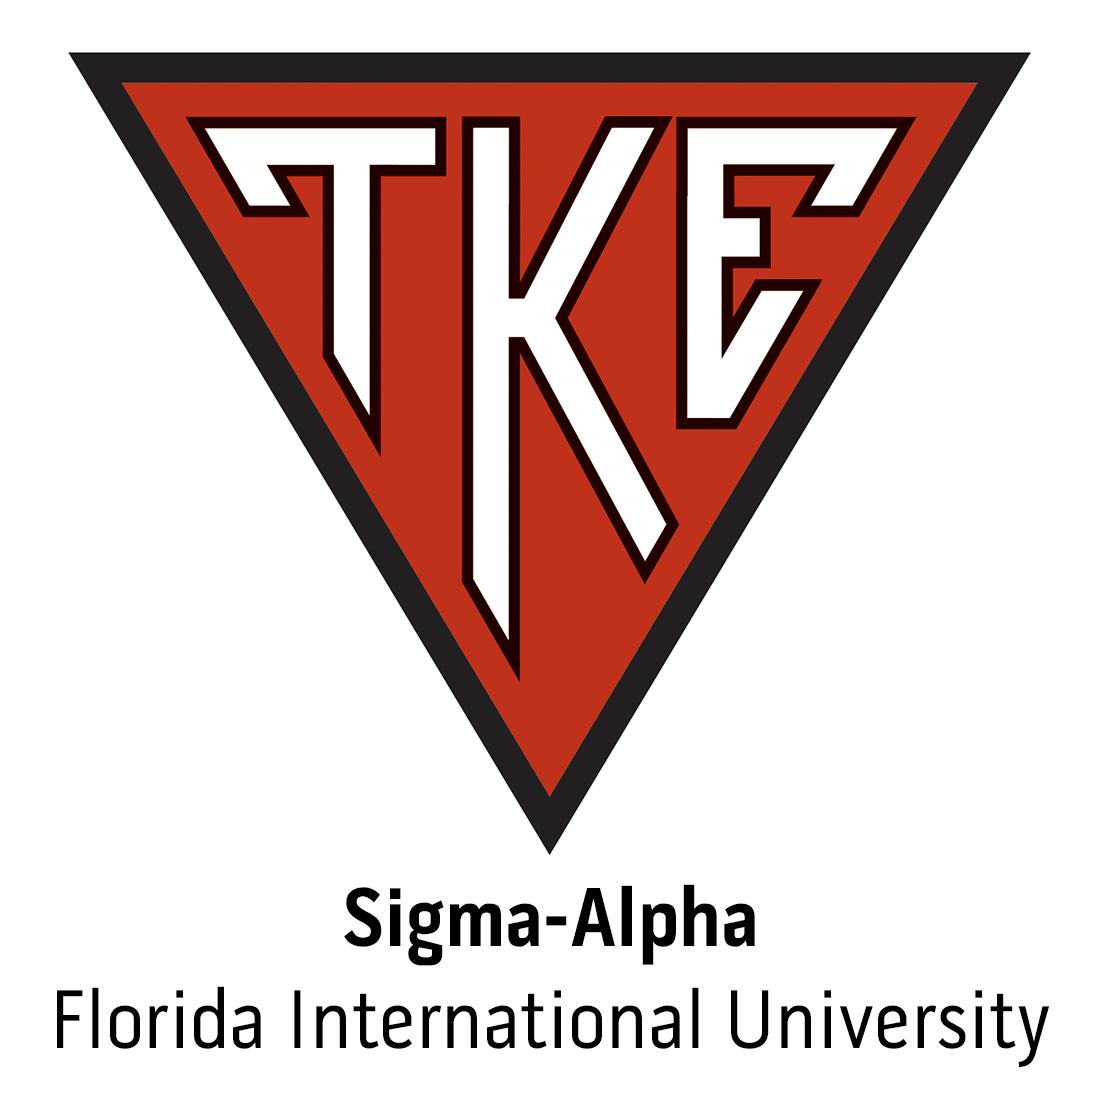 Sigma-Alpha Chapter at Florida International University